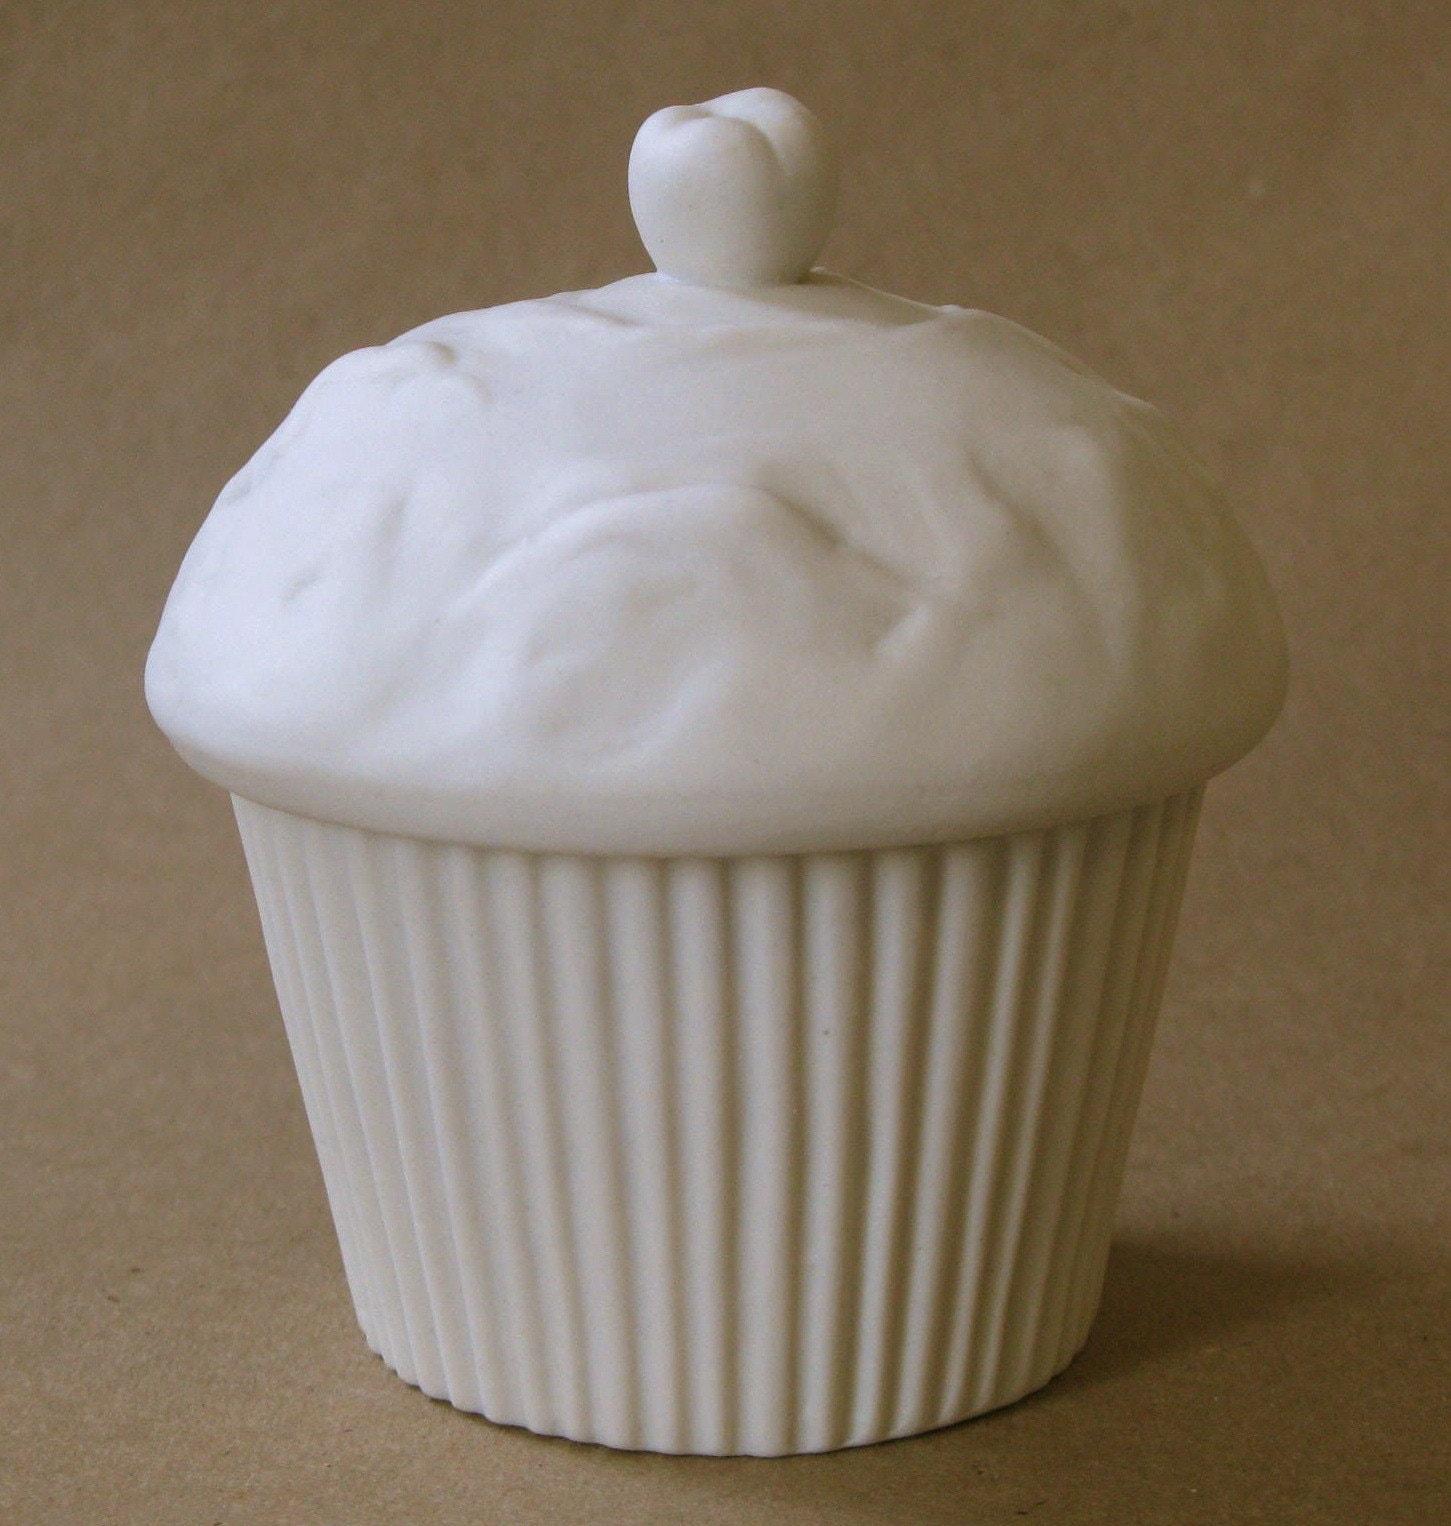 Porcelain Cupcake